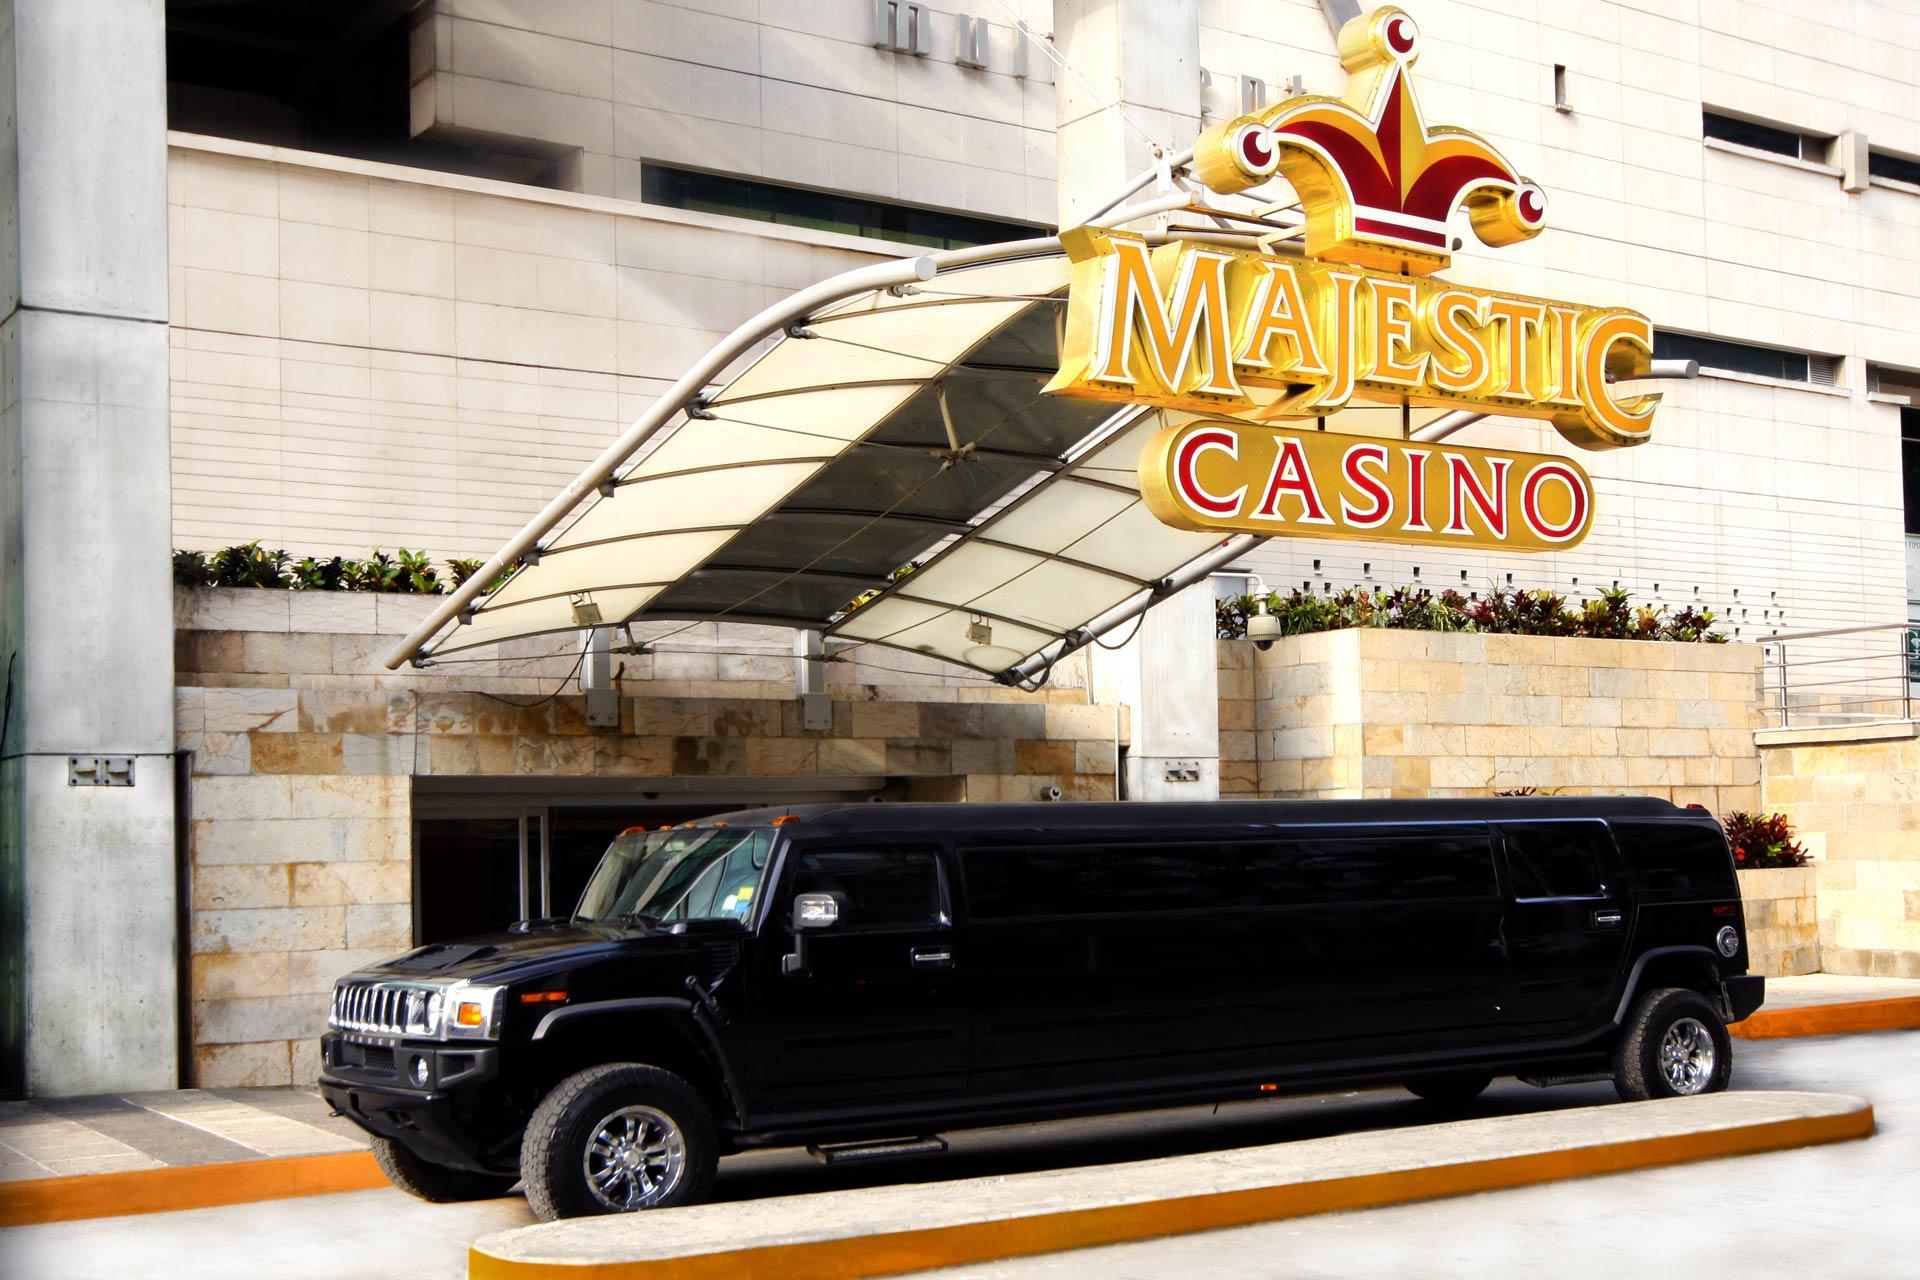 Entrada Casino Majestic Panama City